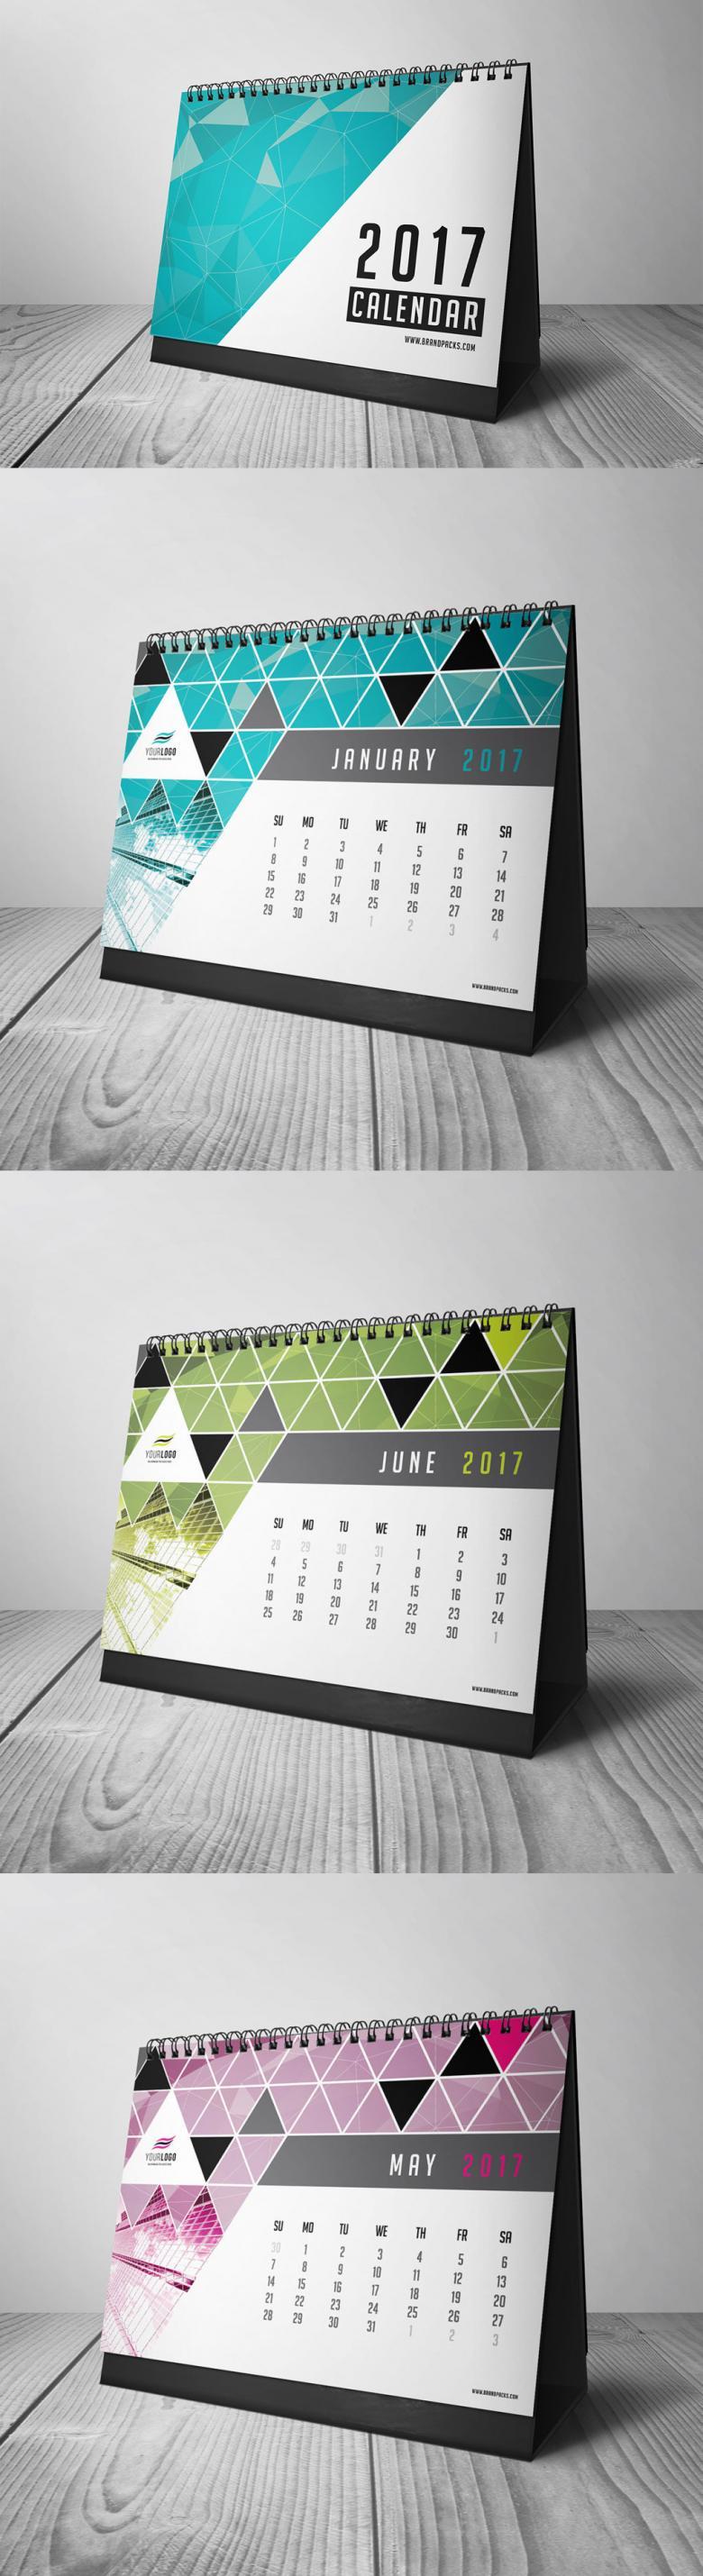 2017 Calendar Print Template